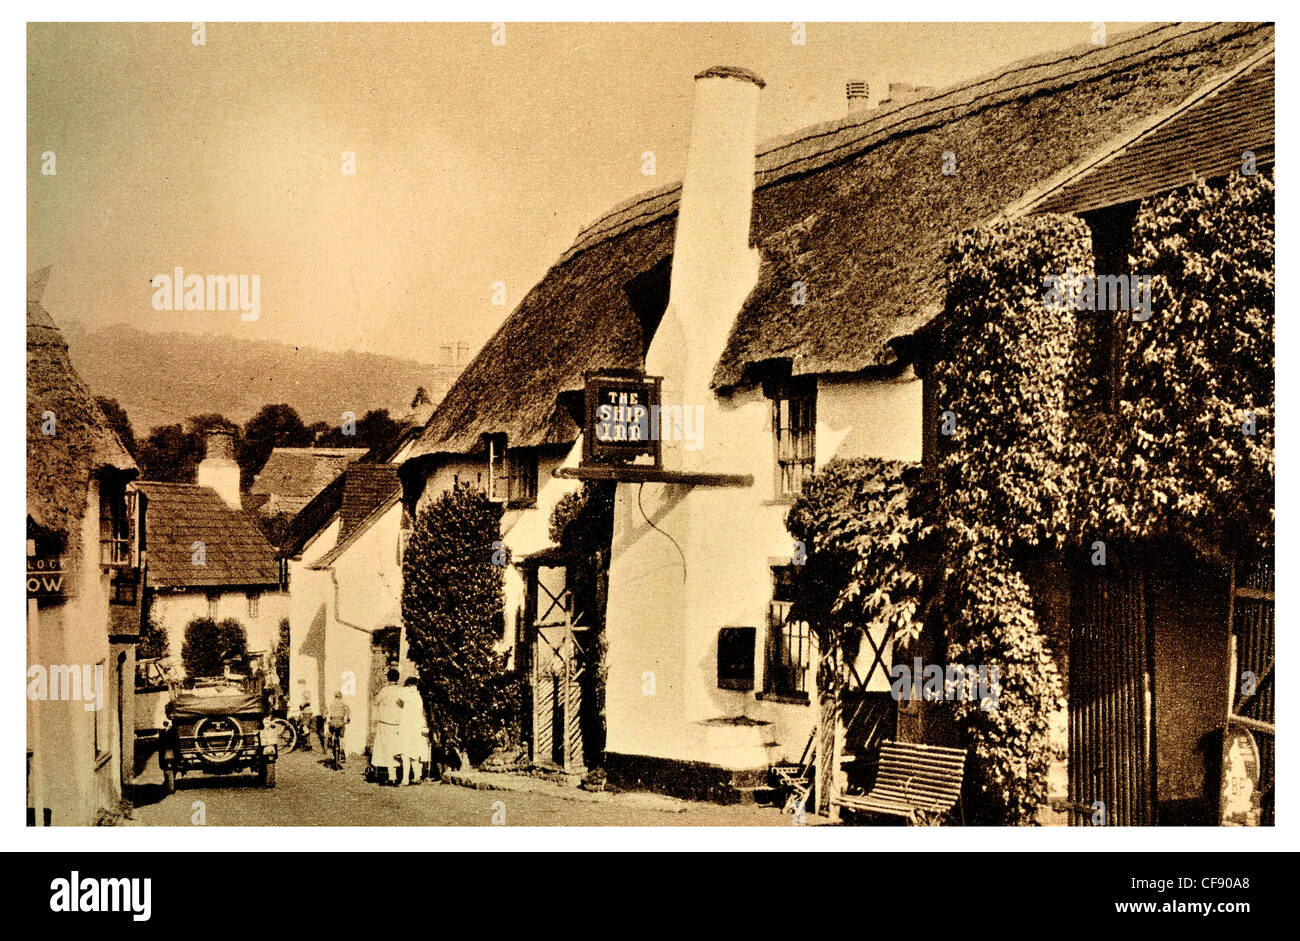 The Ship Inn Porlock thatched thatch public house pub tavern village Somerset South West England Europe UK tourism - Stock Image